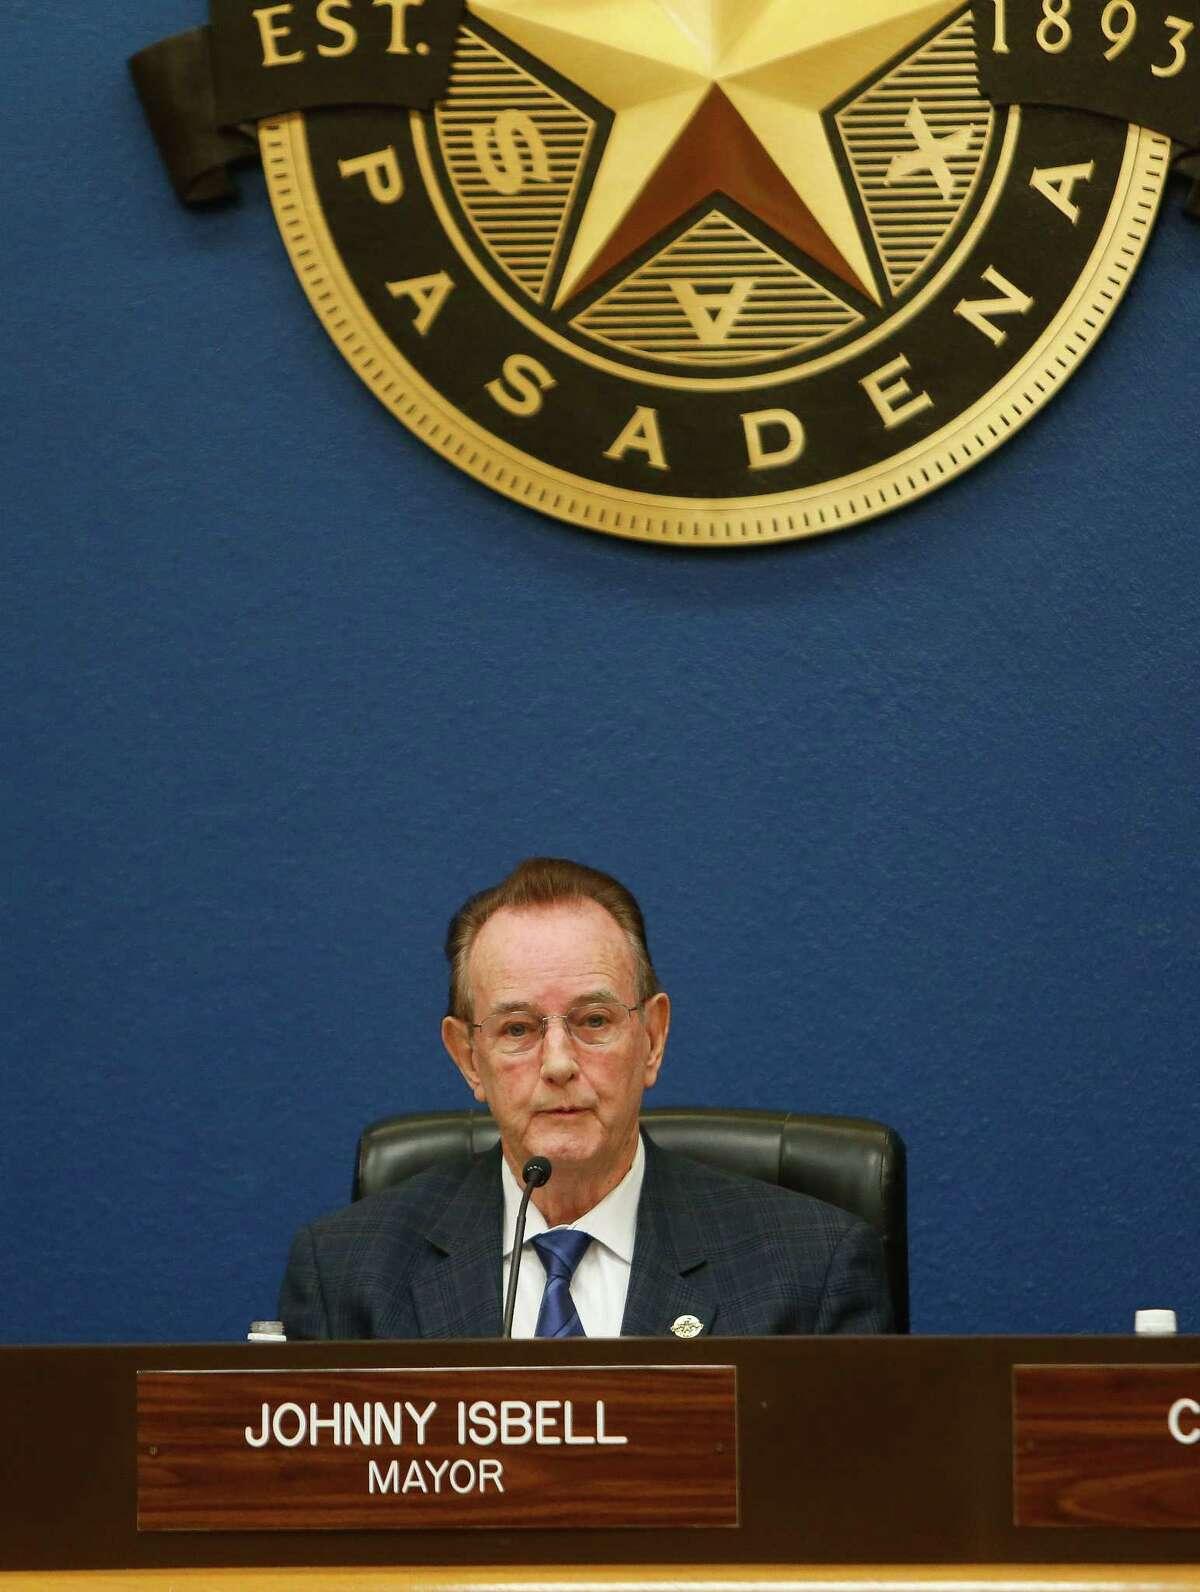 Pasadena mayor Johnny Isbell presides over a city council meeting, Tuesday, May 5, 2017, in Pasadena. (Mark Mulligan / Houston Chronicle)